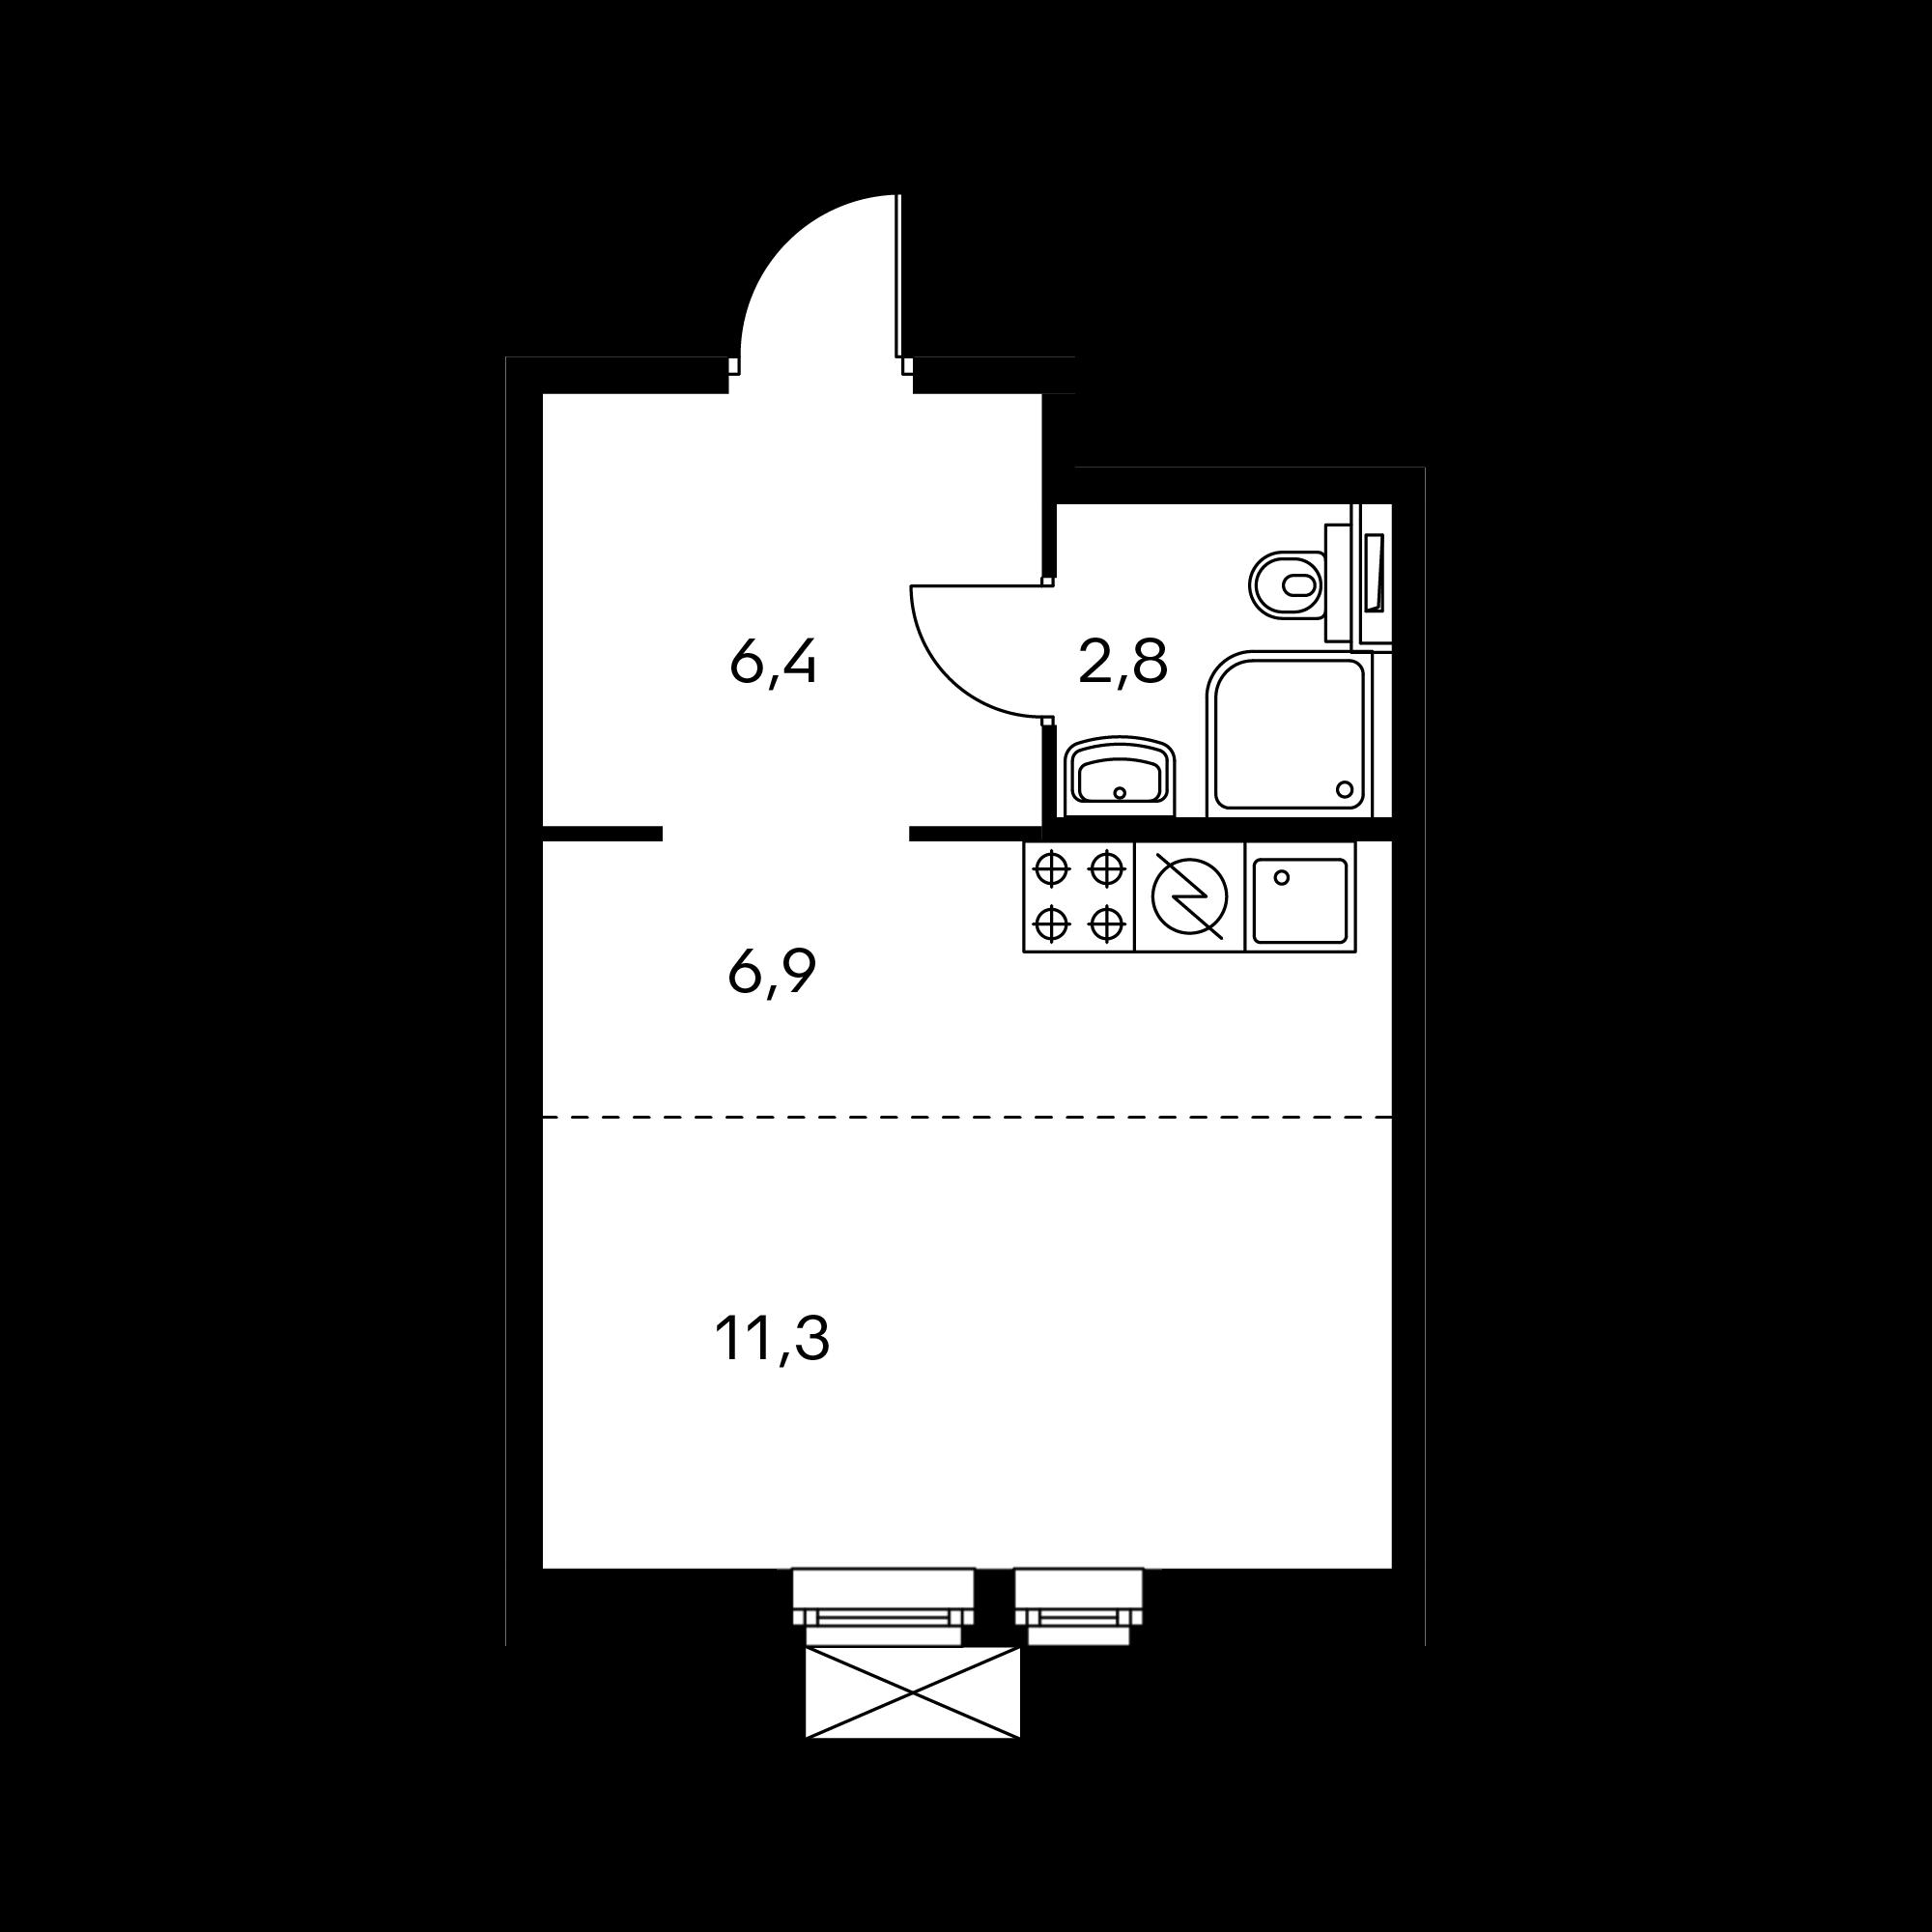 1NM1_4.8-3